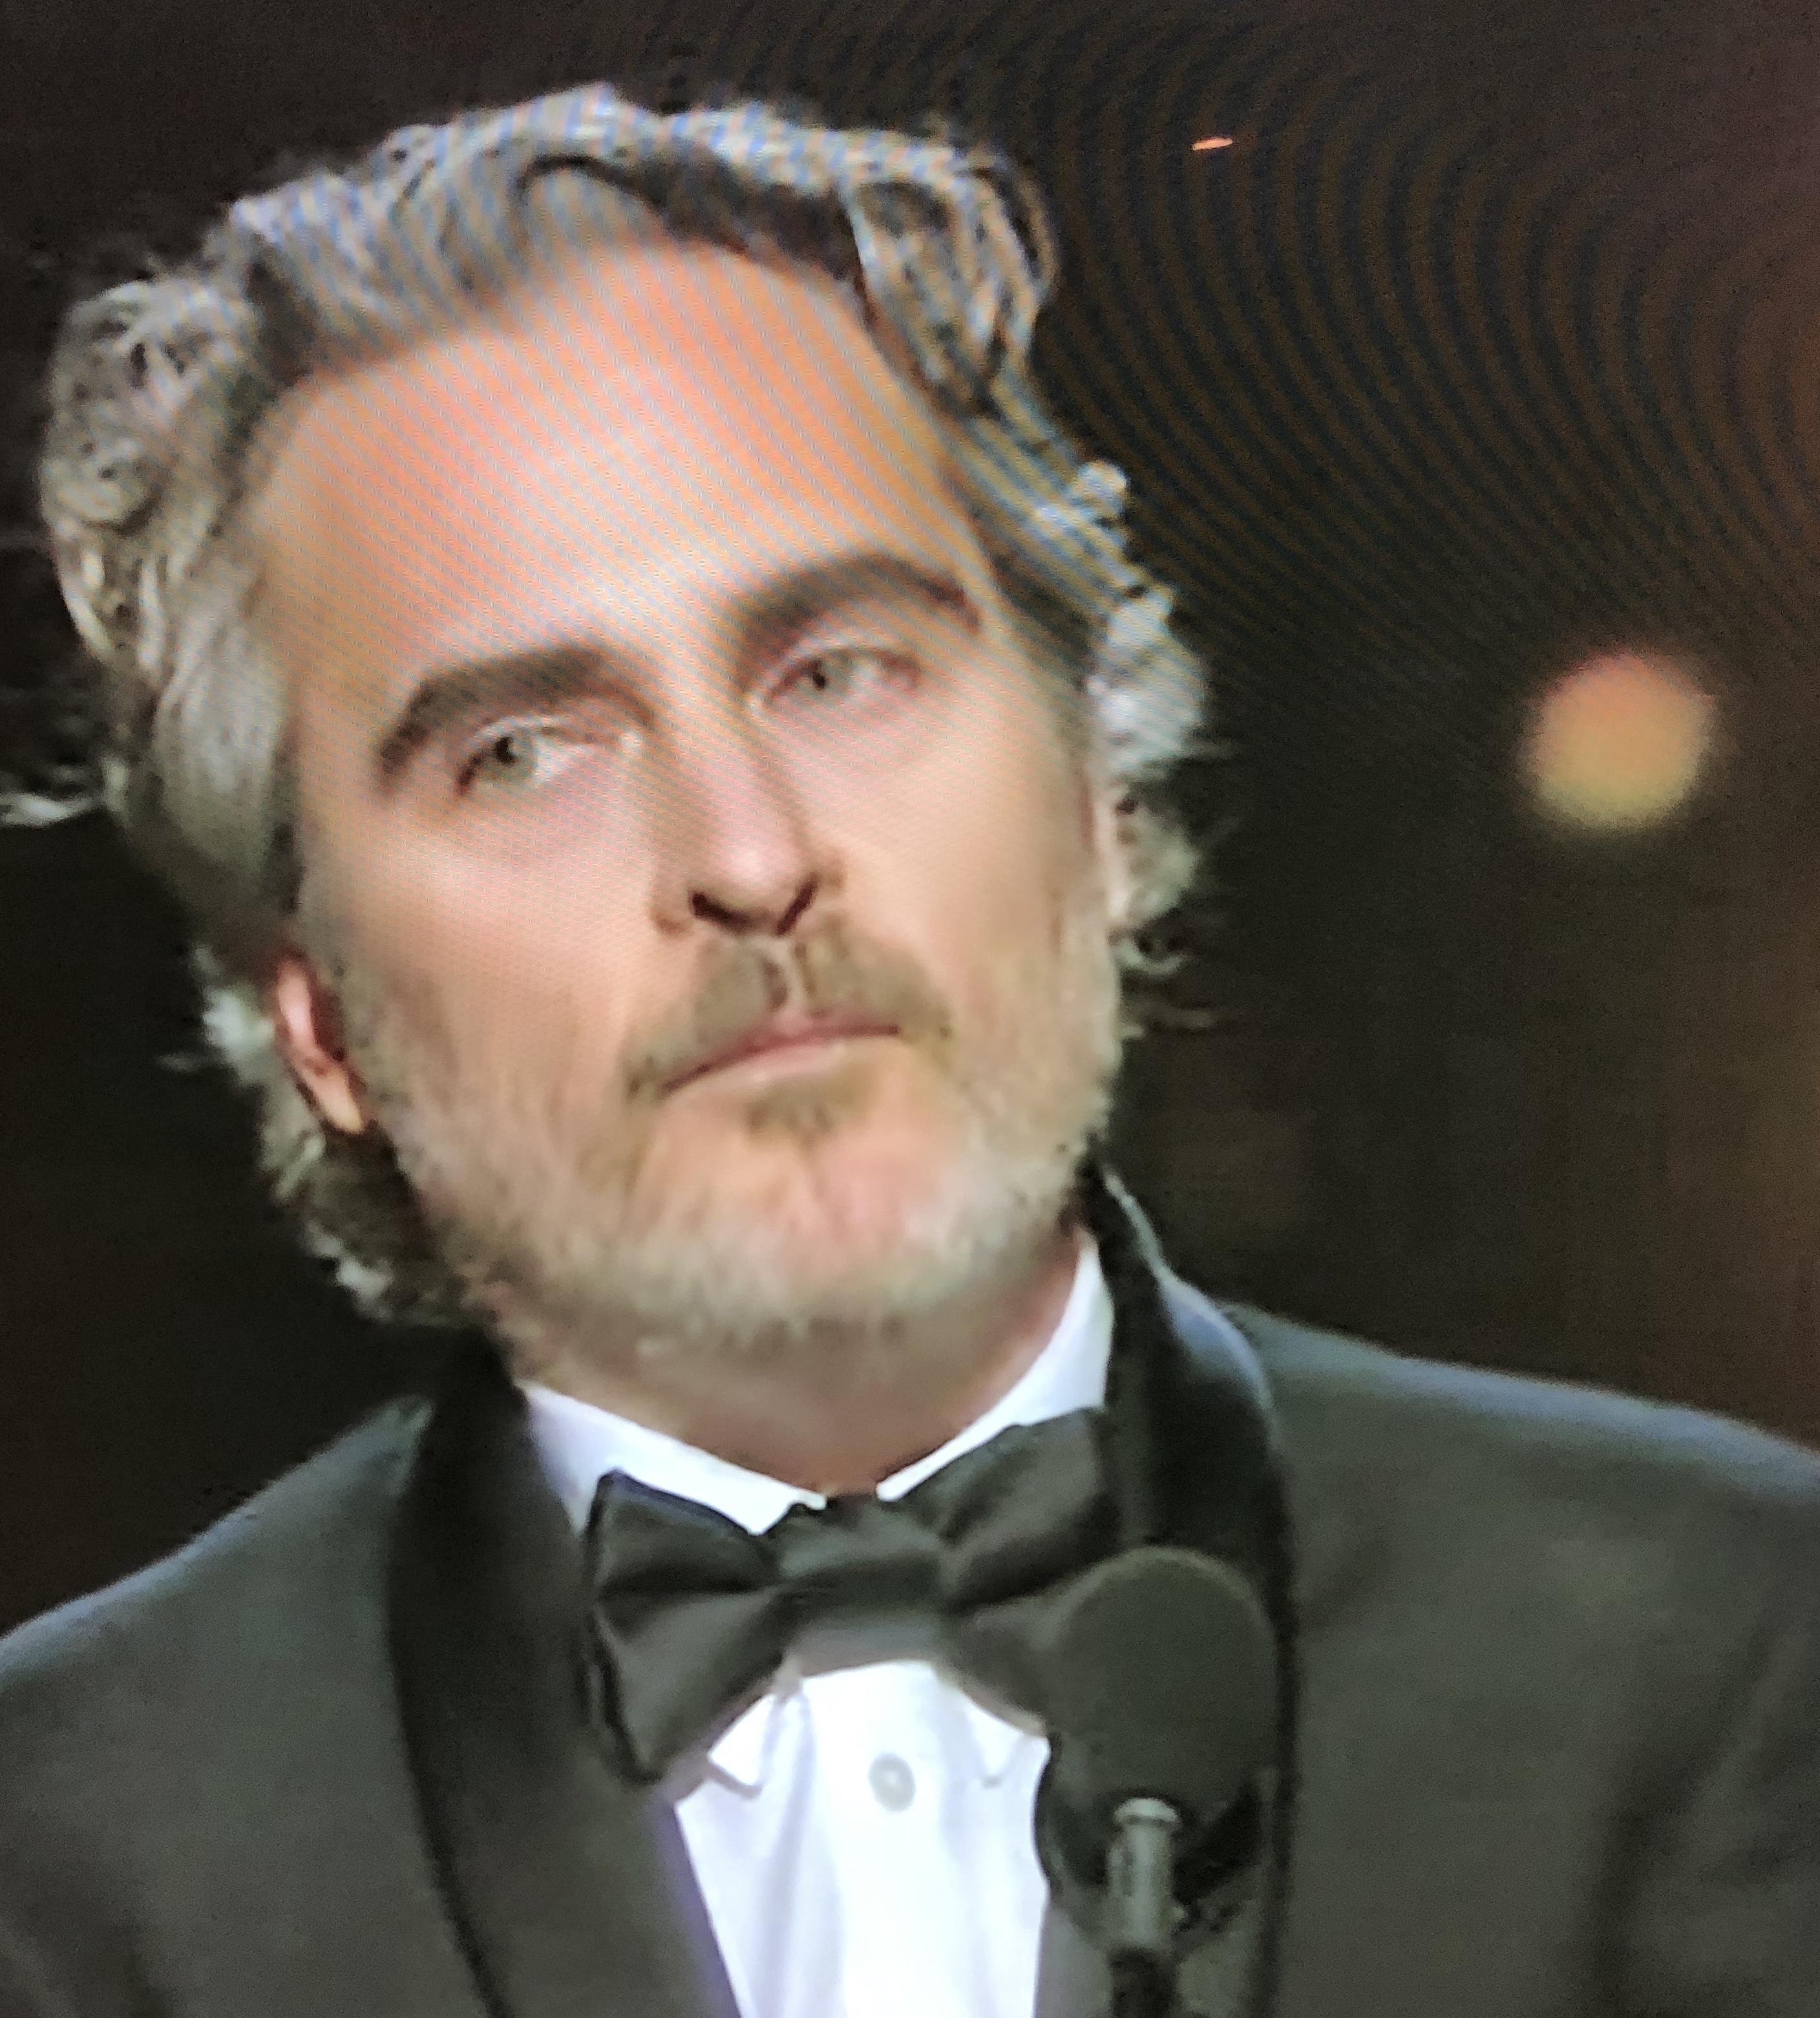 Phoneix won the best actor for Joker